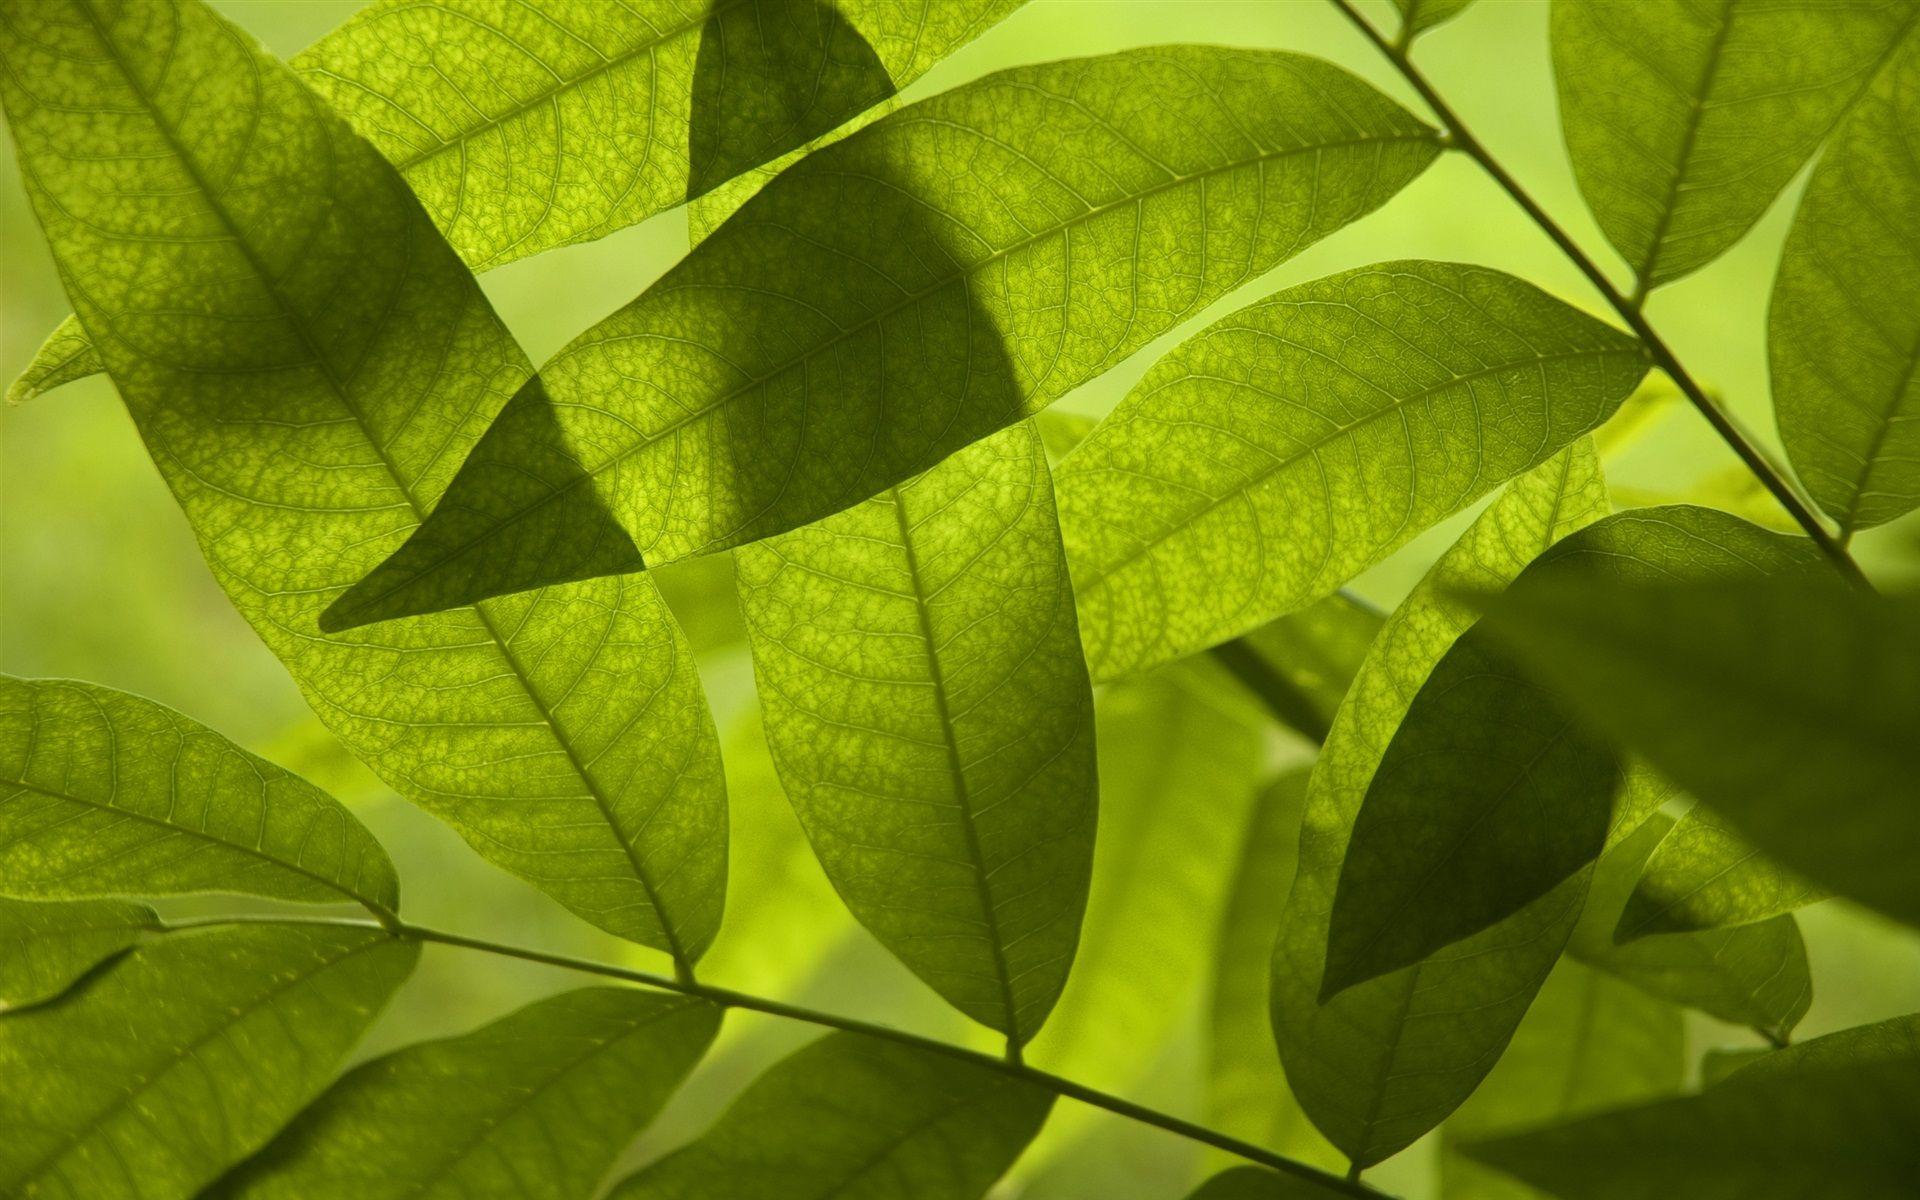 Fondos de pantalla verde hoja